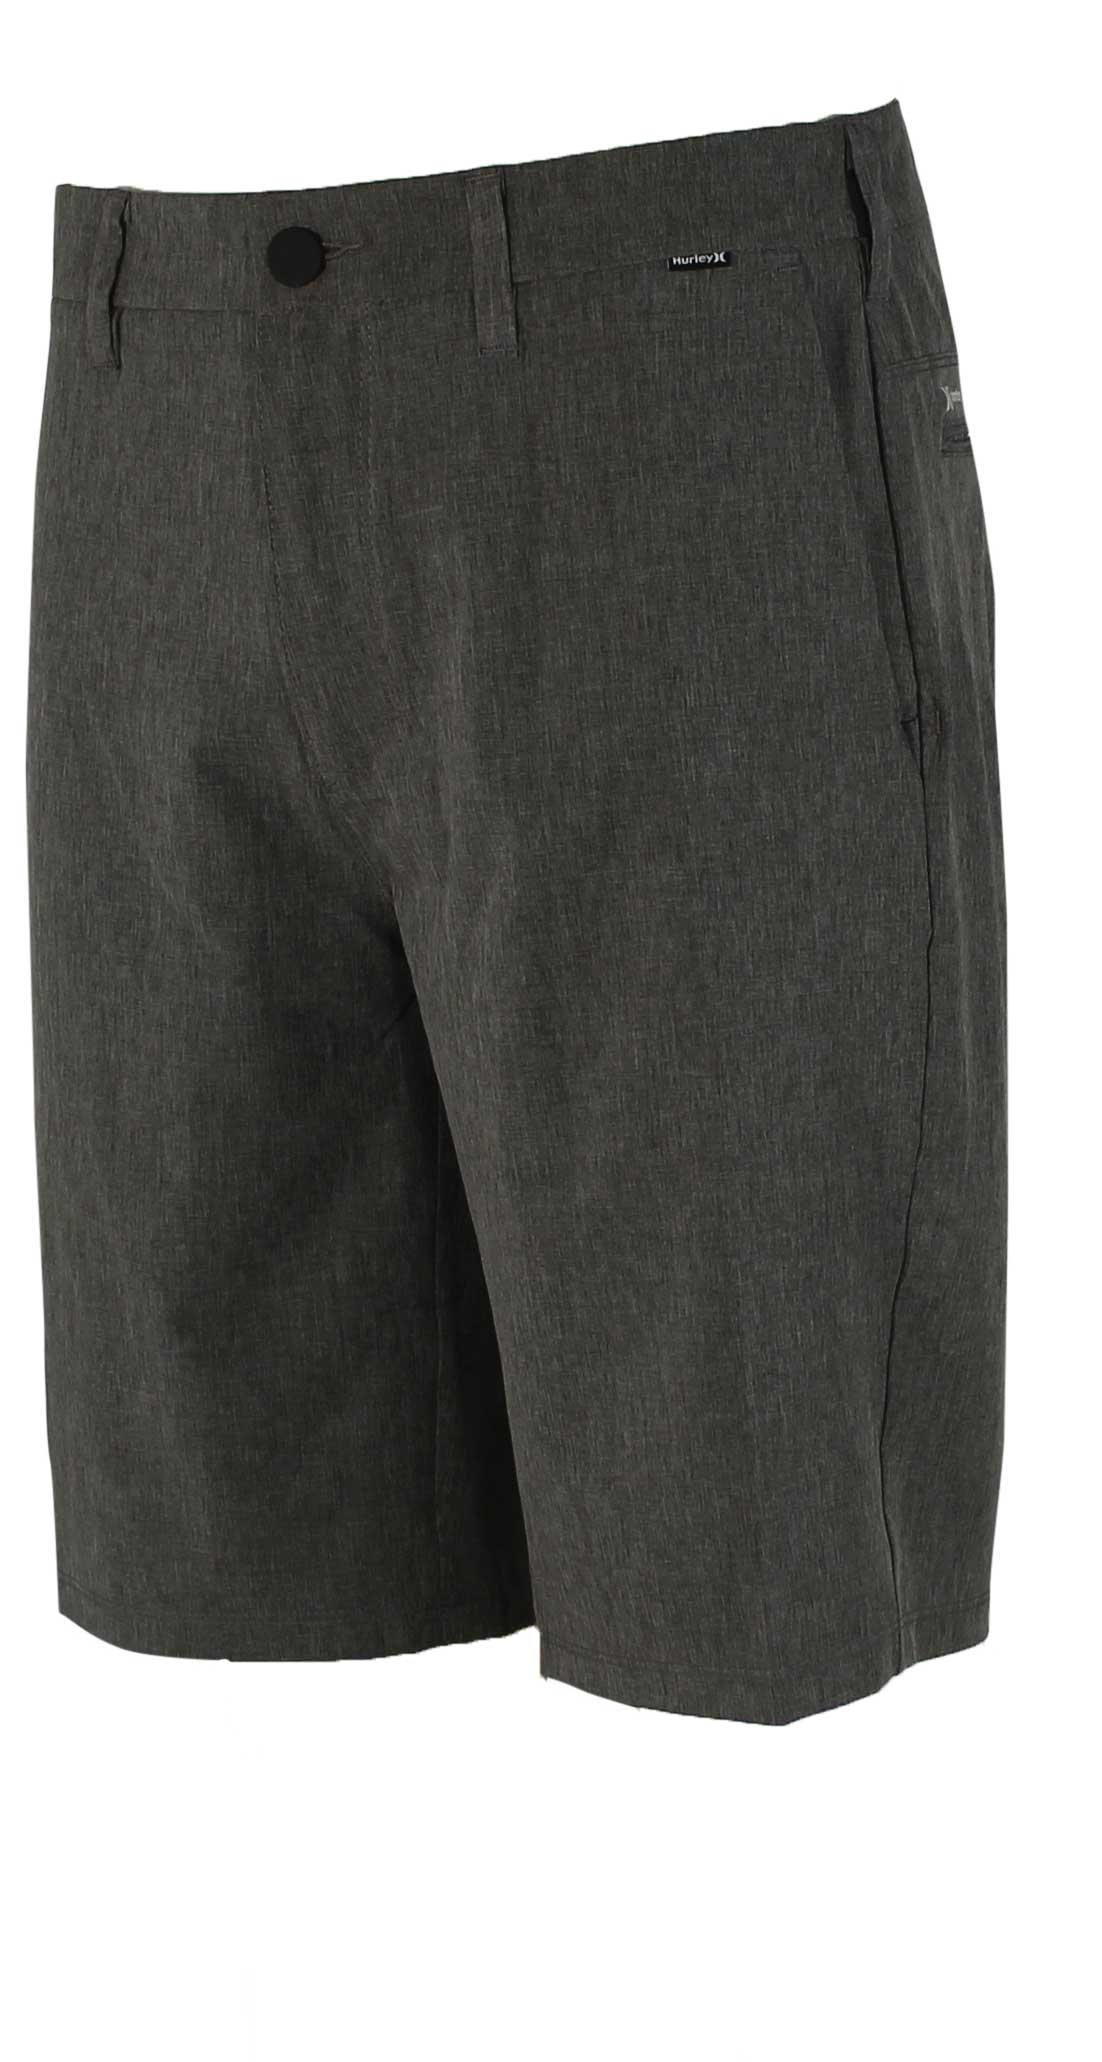 Hurley Men's Phantom 20'' Walkshorts, Black Heather, 38